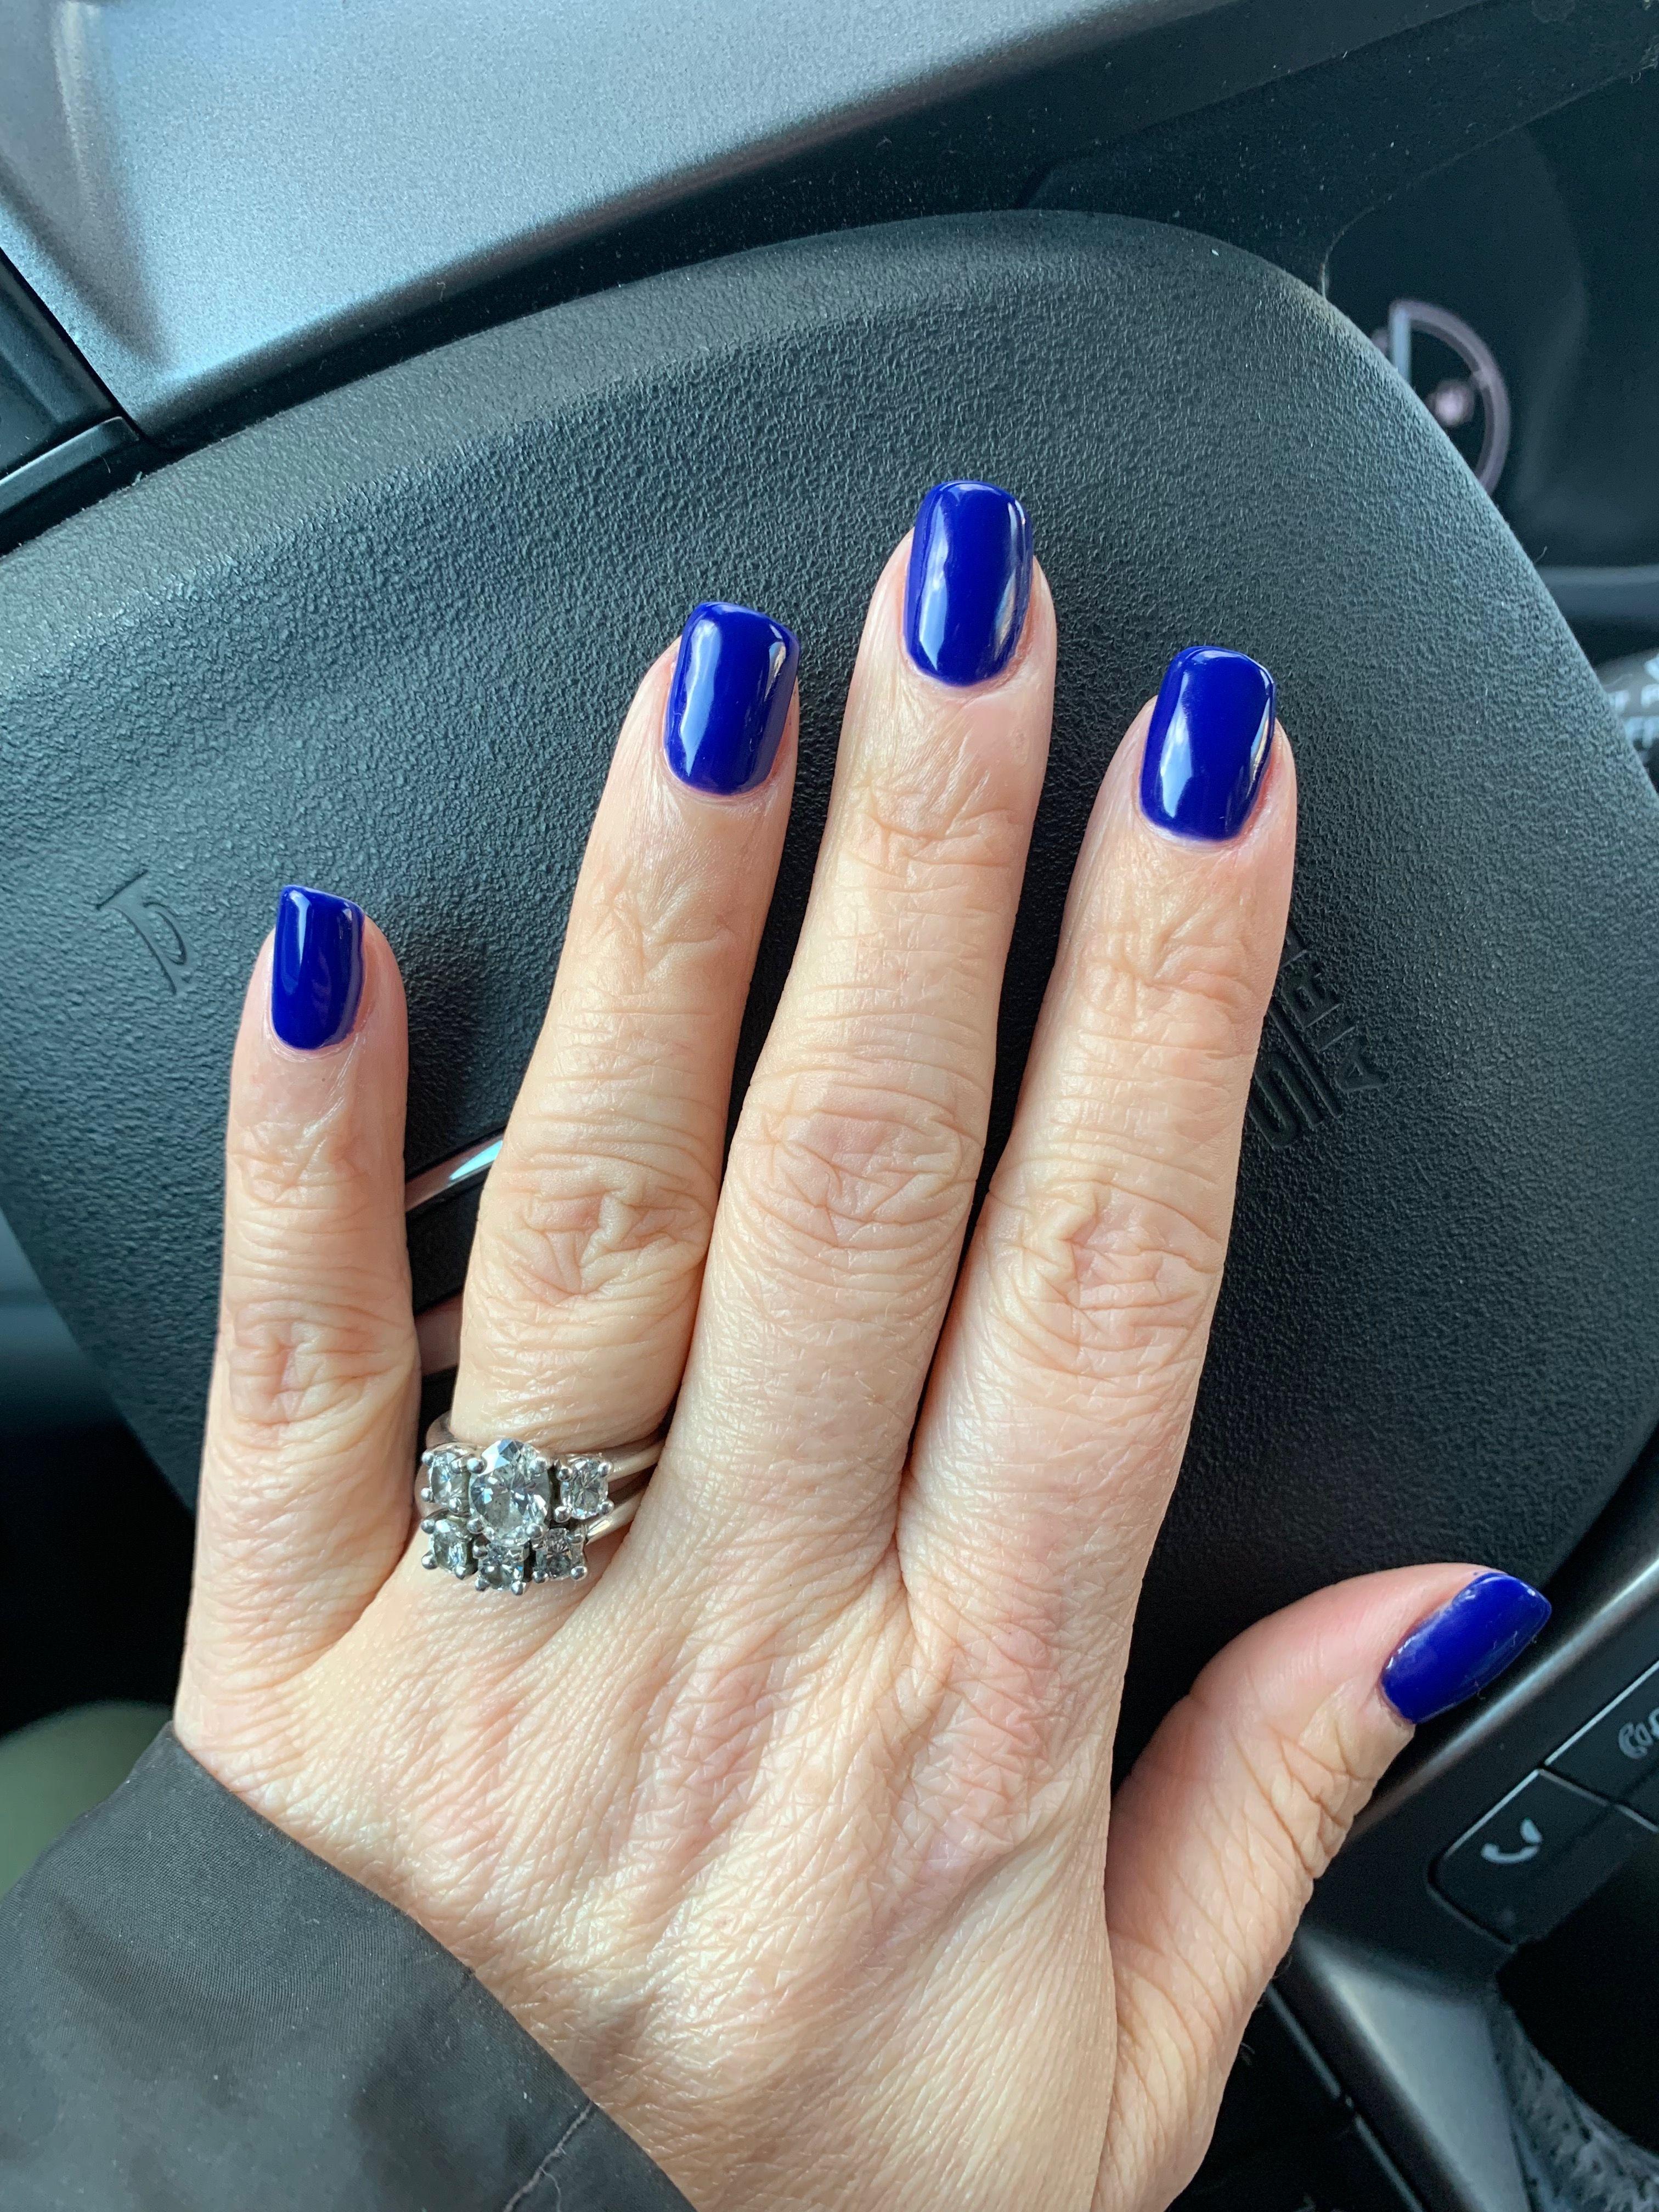 Cnd Blue Moon Gel Nails Cnd Shellac Nails